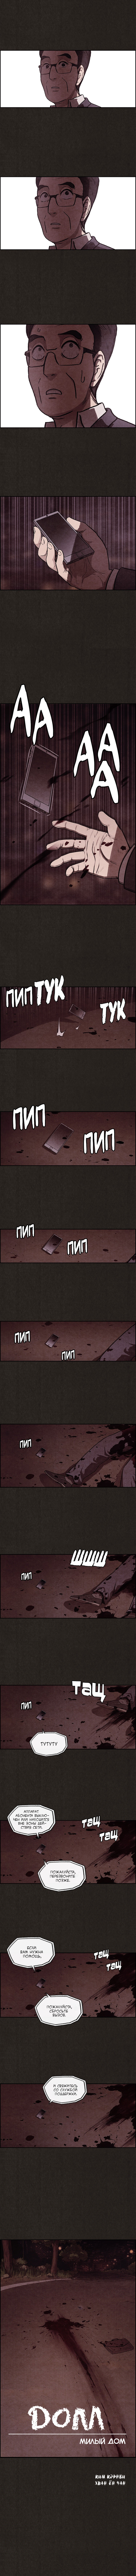 https://r1.ninemanga.com/comics/pic2/26/33050/415966/1532297472155.jpg Page 2